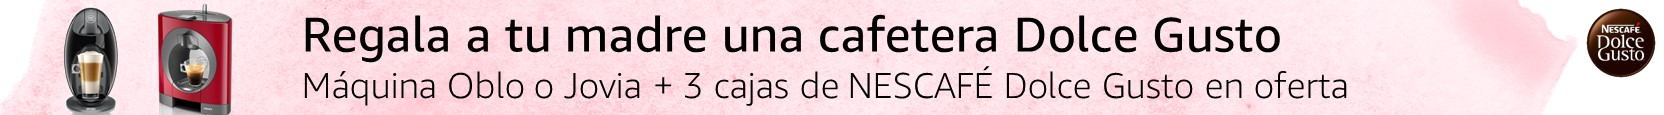 Regala a tu madre una cafetera Dolce Gusto. Máquina Oblo o Jovia + 3 cajas de NESCAFÉ Dolce Gusto en oferta